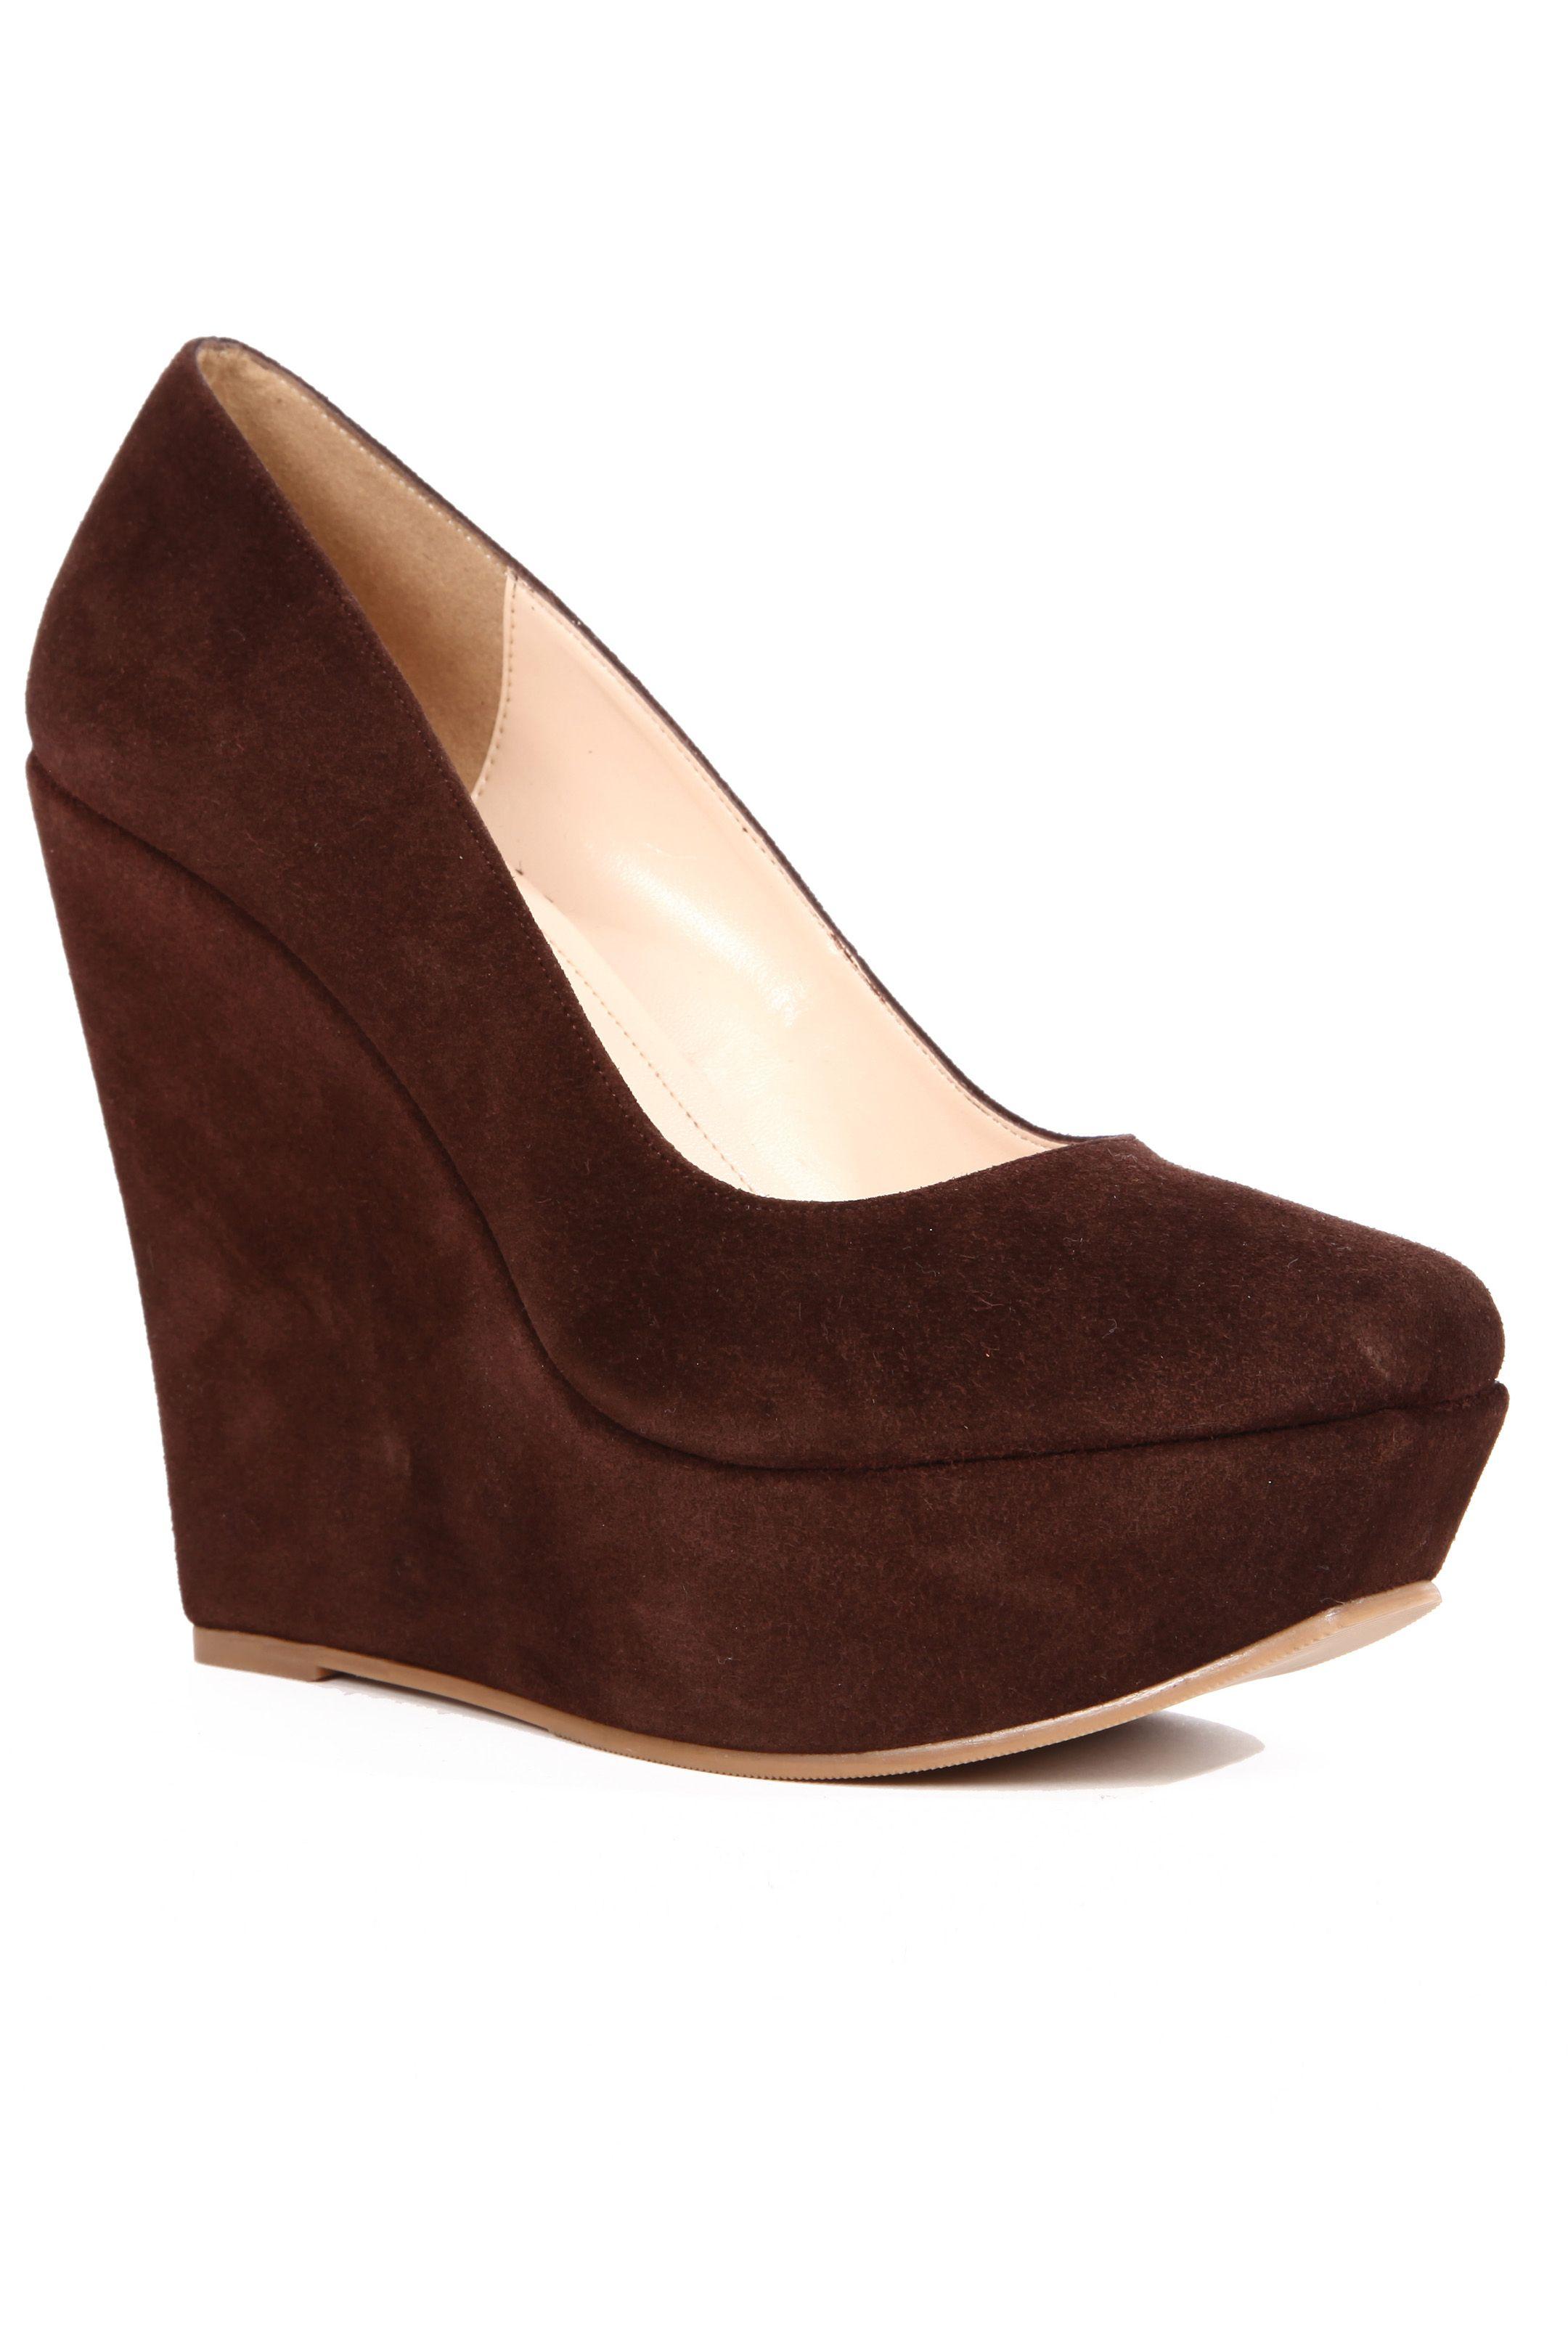 Zapato de plataforma corrida color chocolate en gamuza. Tacón 13 cms    1 b527fb3d144